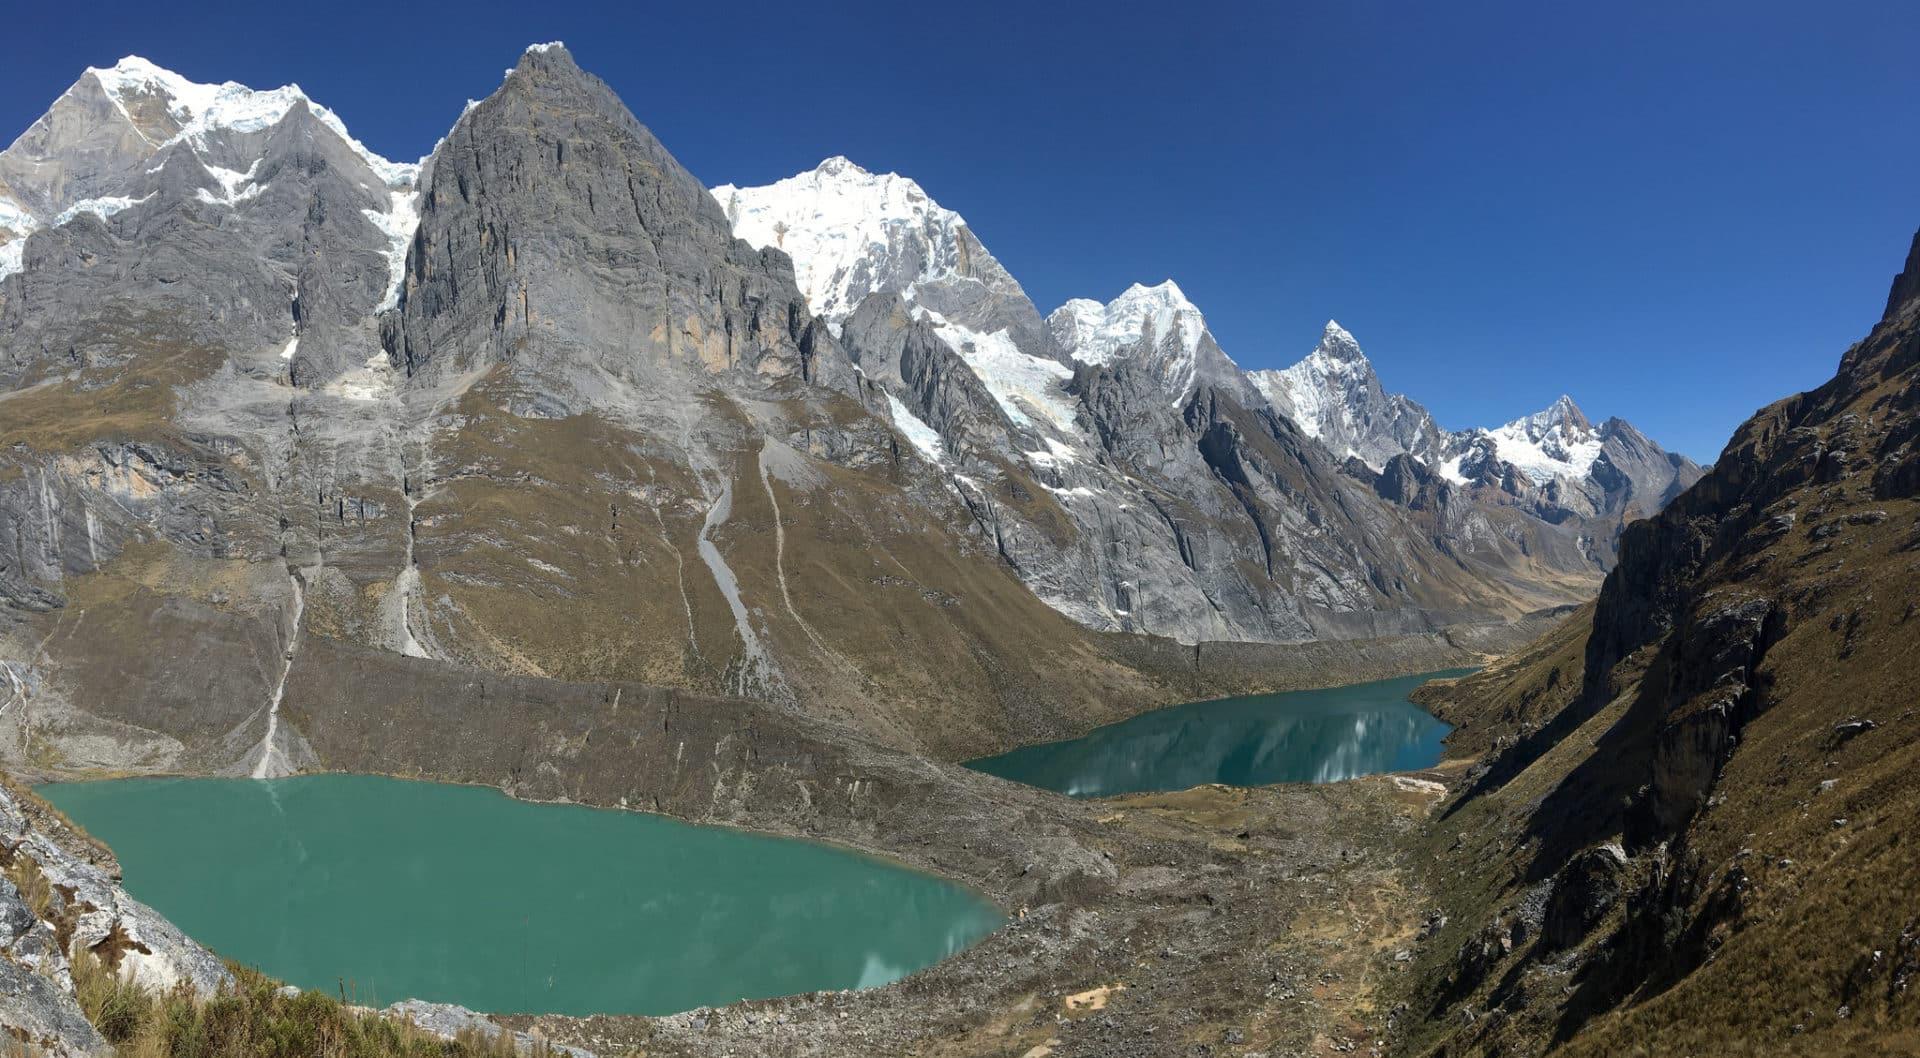 9-day trek in the Cordillera Huayhuash